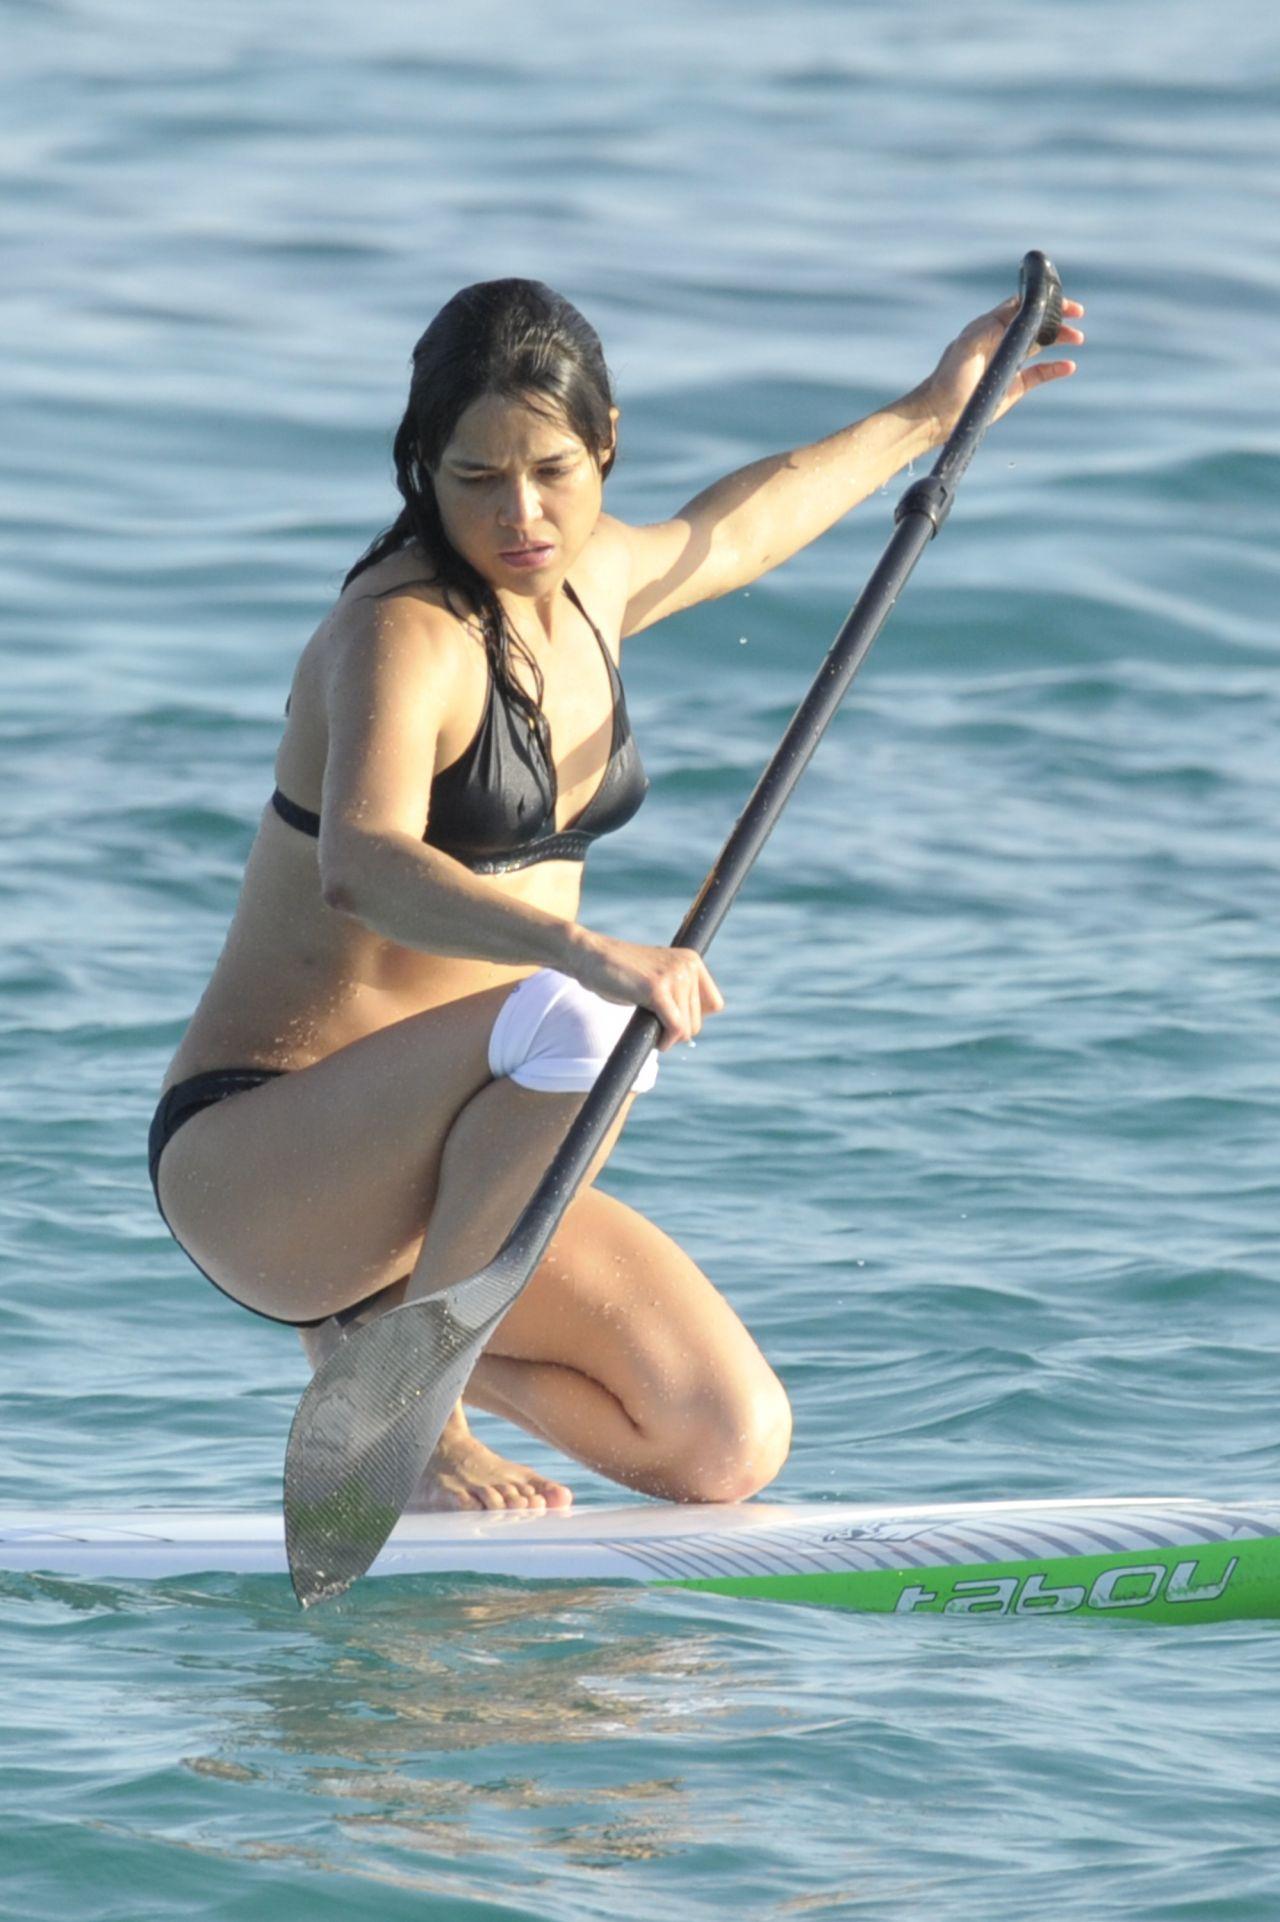 Michelle Rodriguez Paddle Boating In Bikini Sardinia